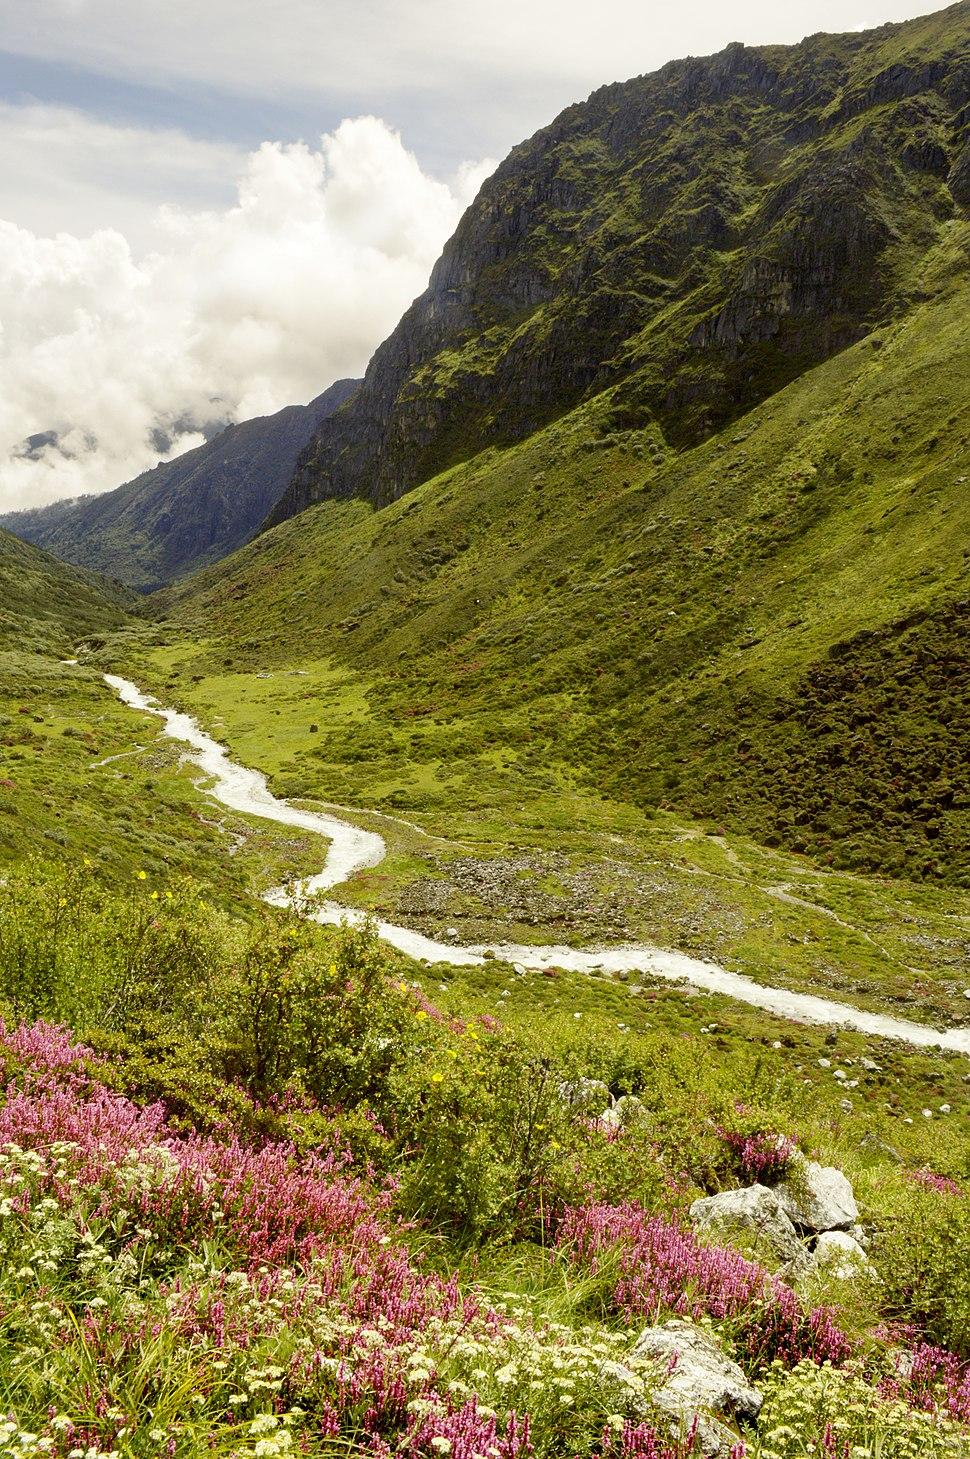 A scene from Kanchenjunga National Park, Sikkim (1)